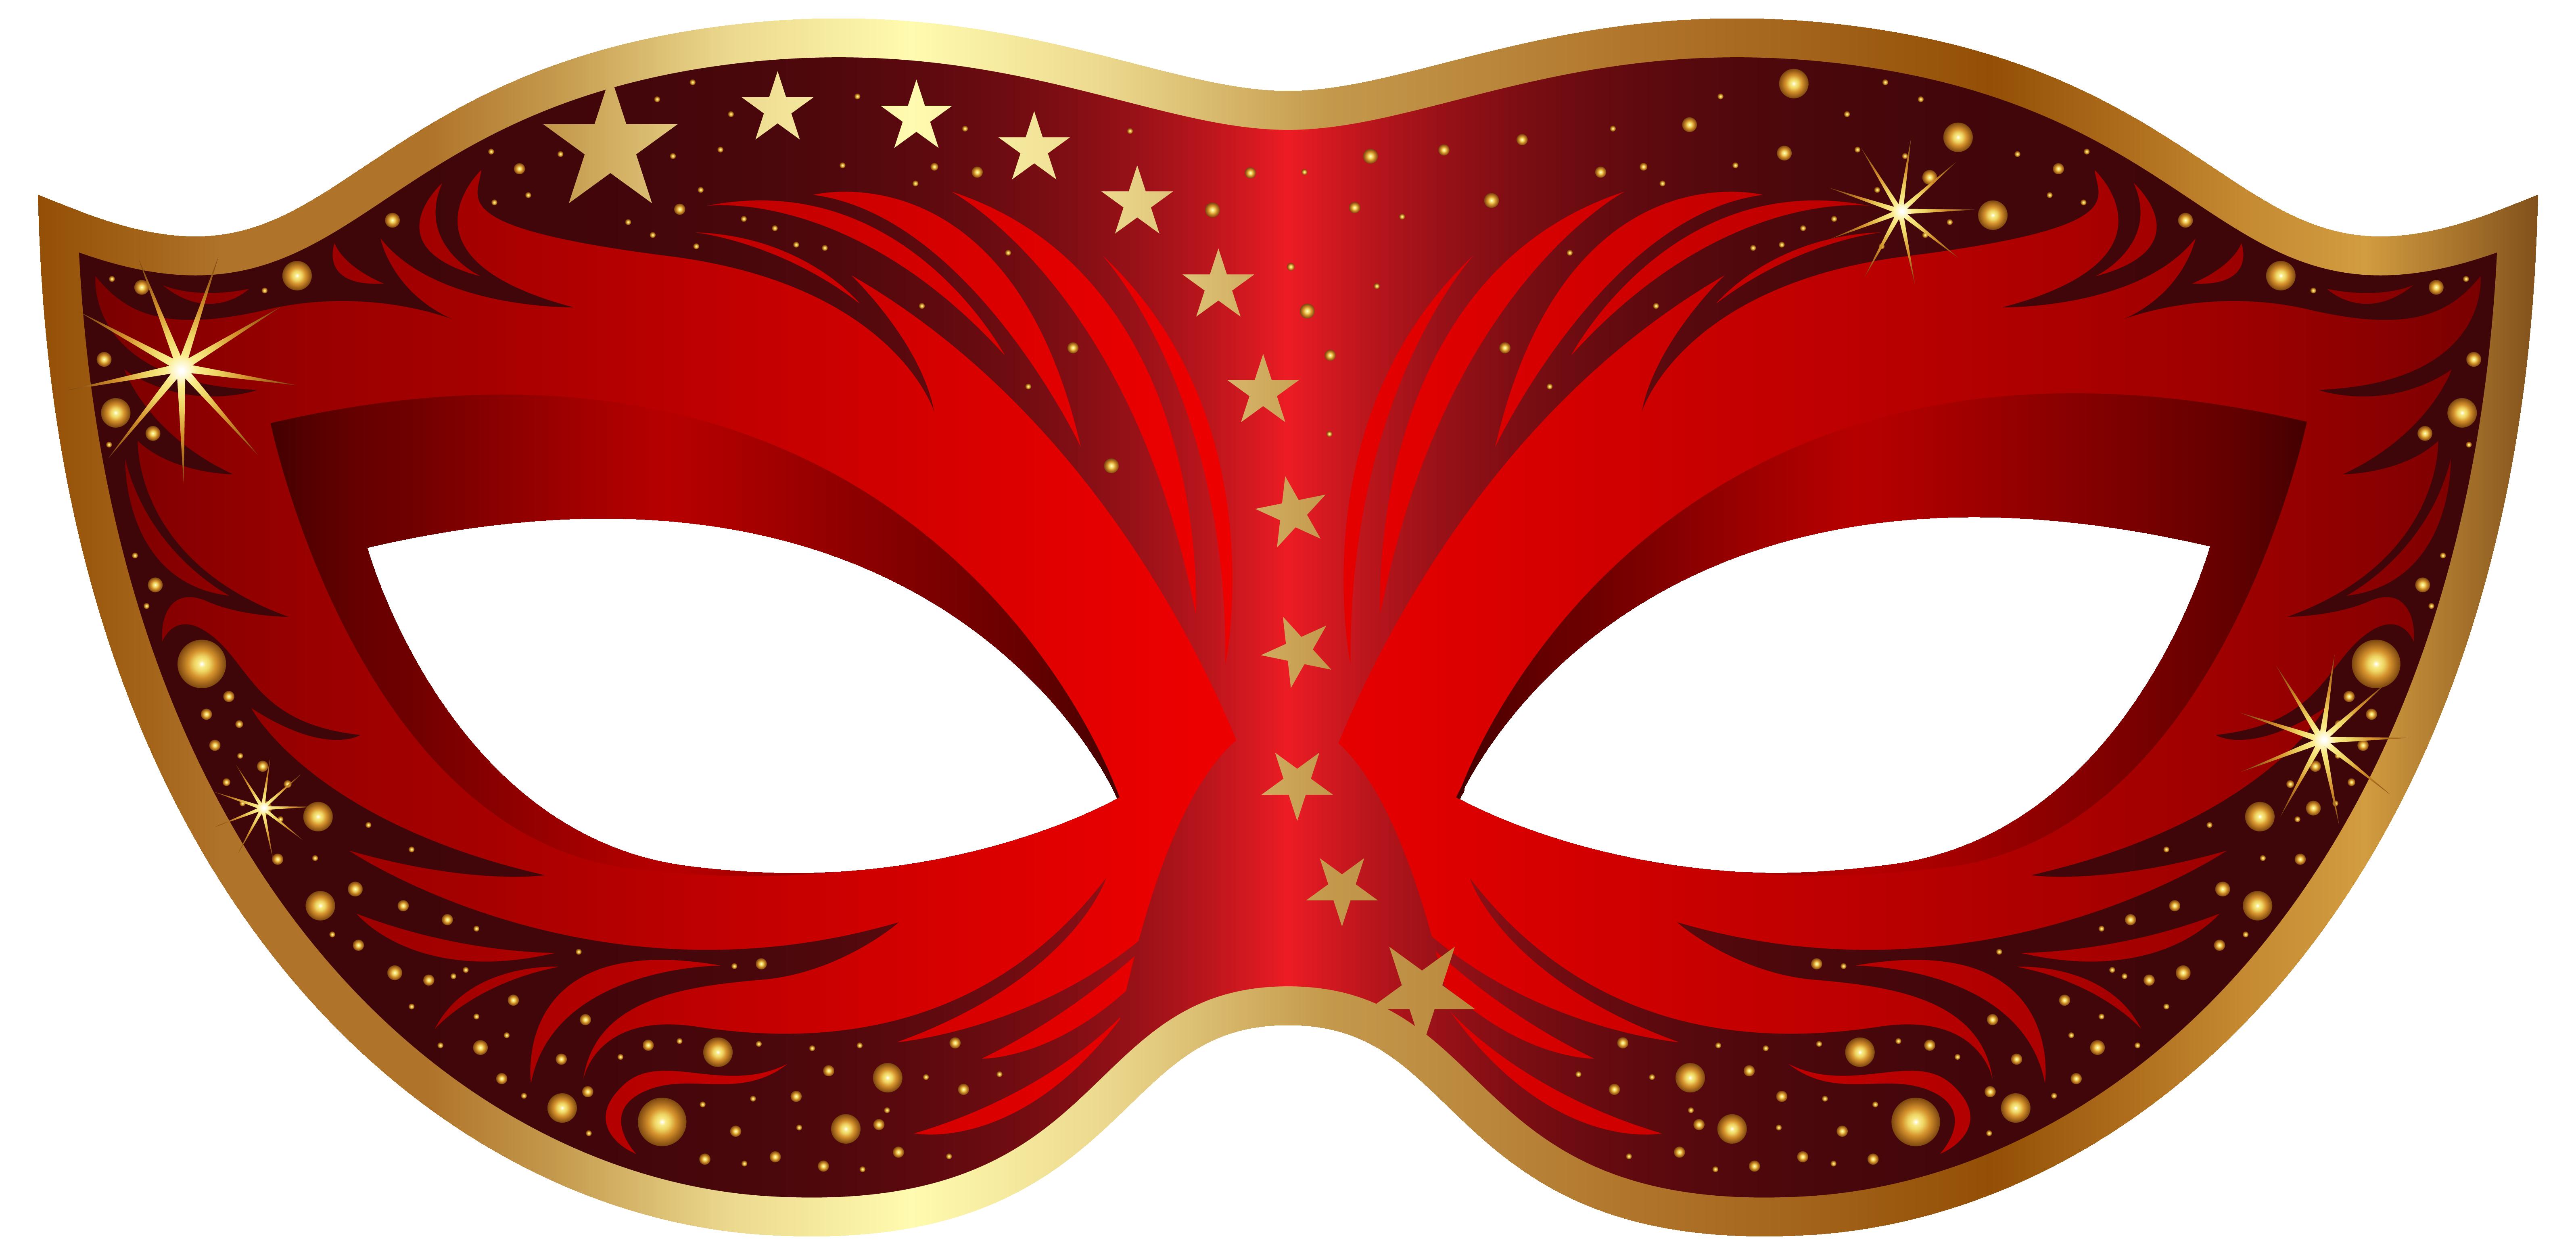 Carneval clipart carnival mask Art ClipartBarn image clip free